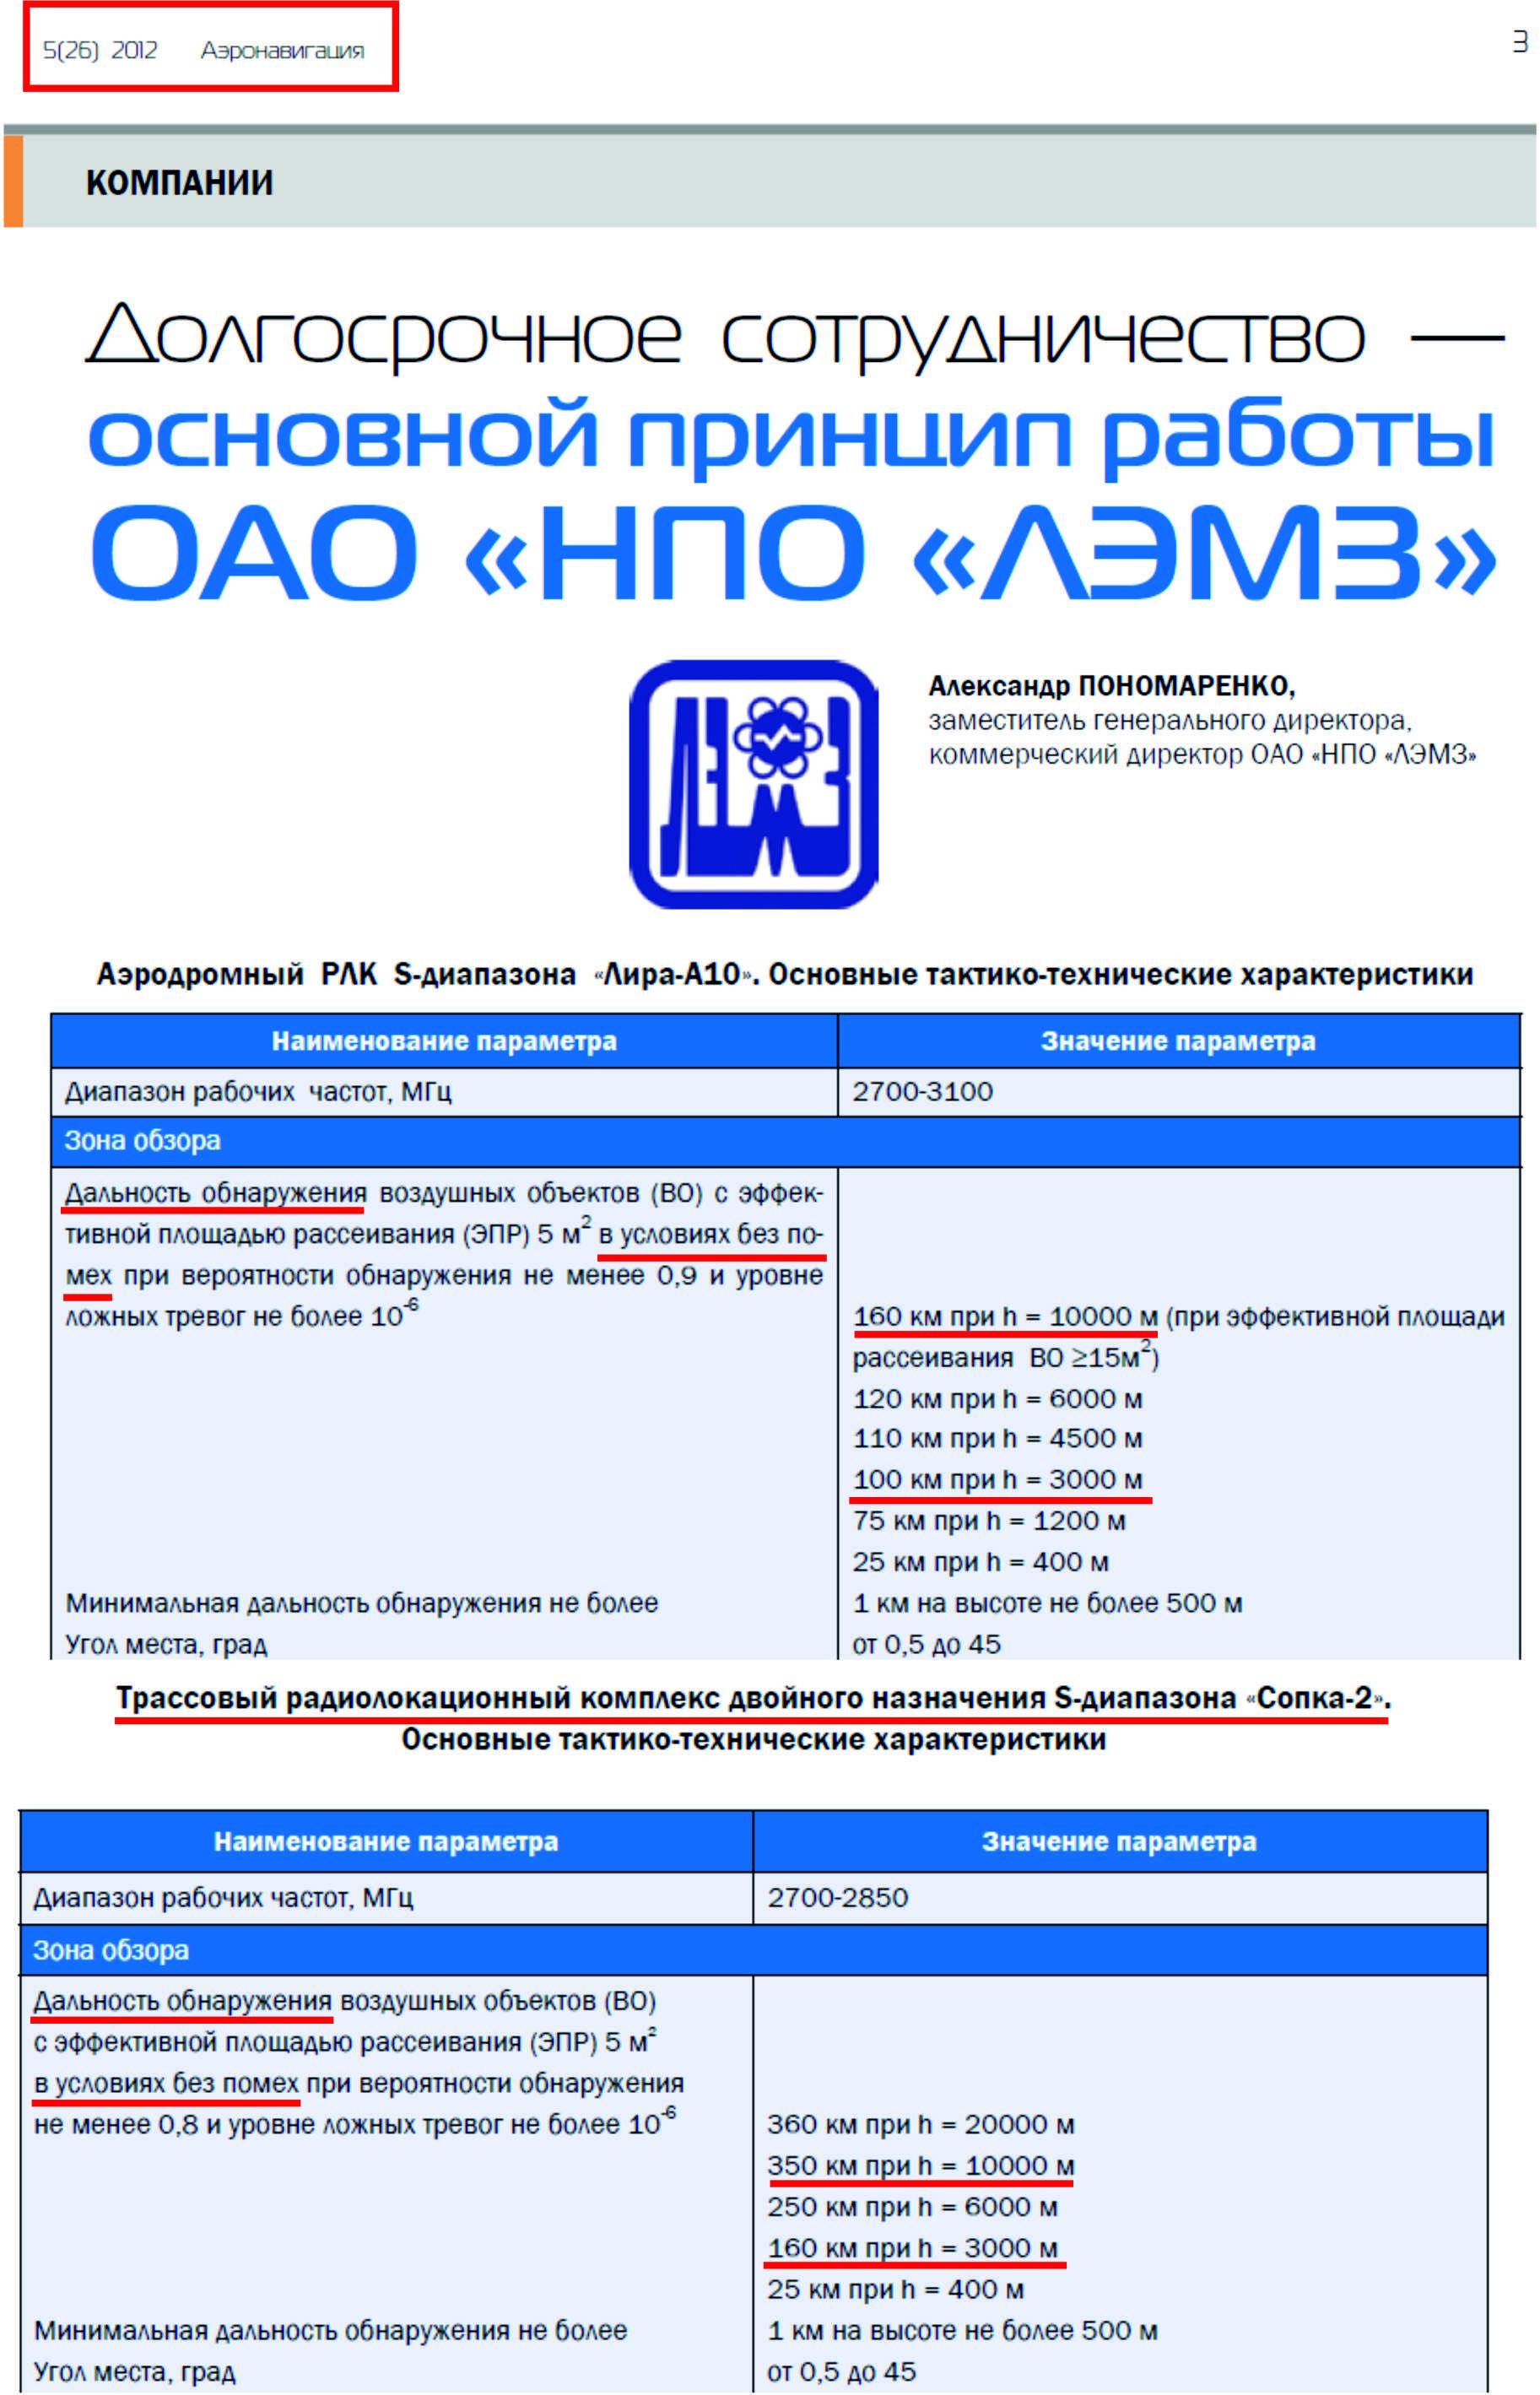 http://images.vfl.ru/ii/1617218330/134ed7da/33897992.jpg